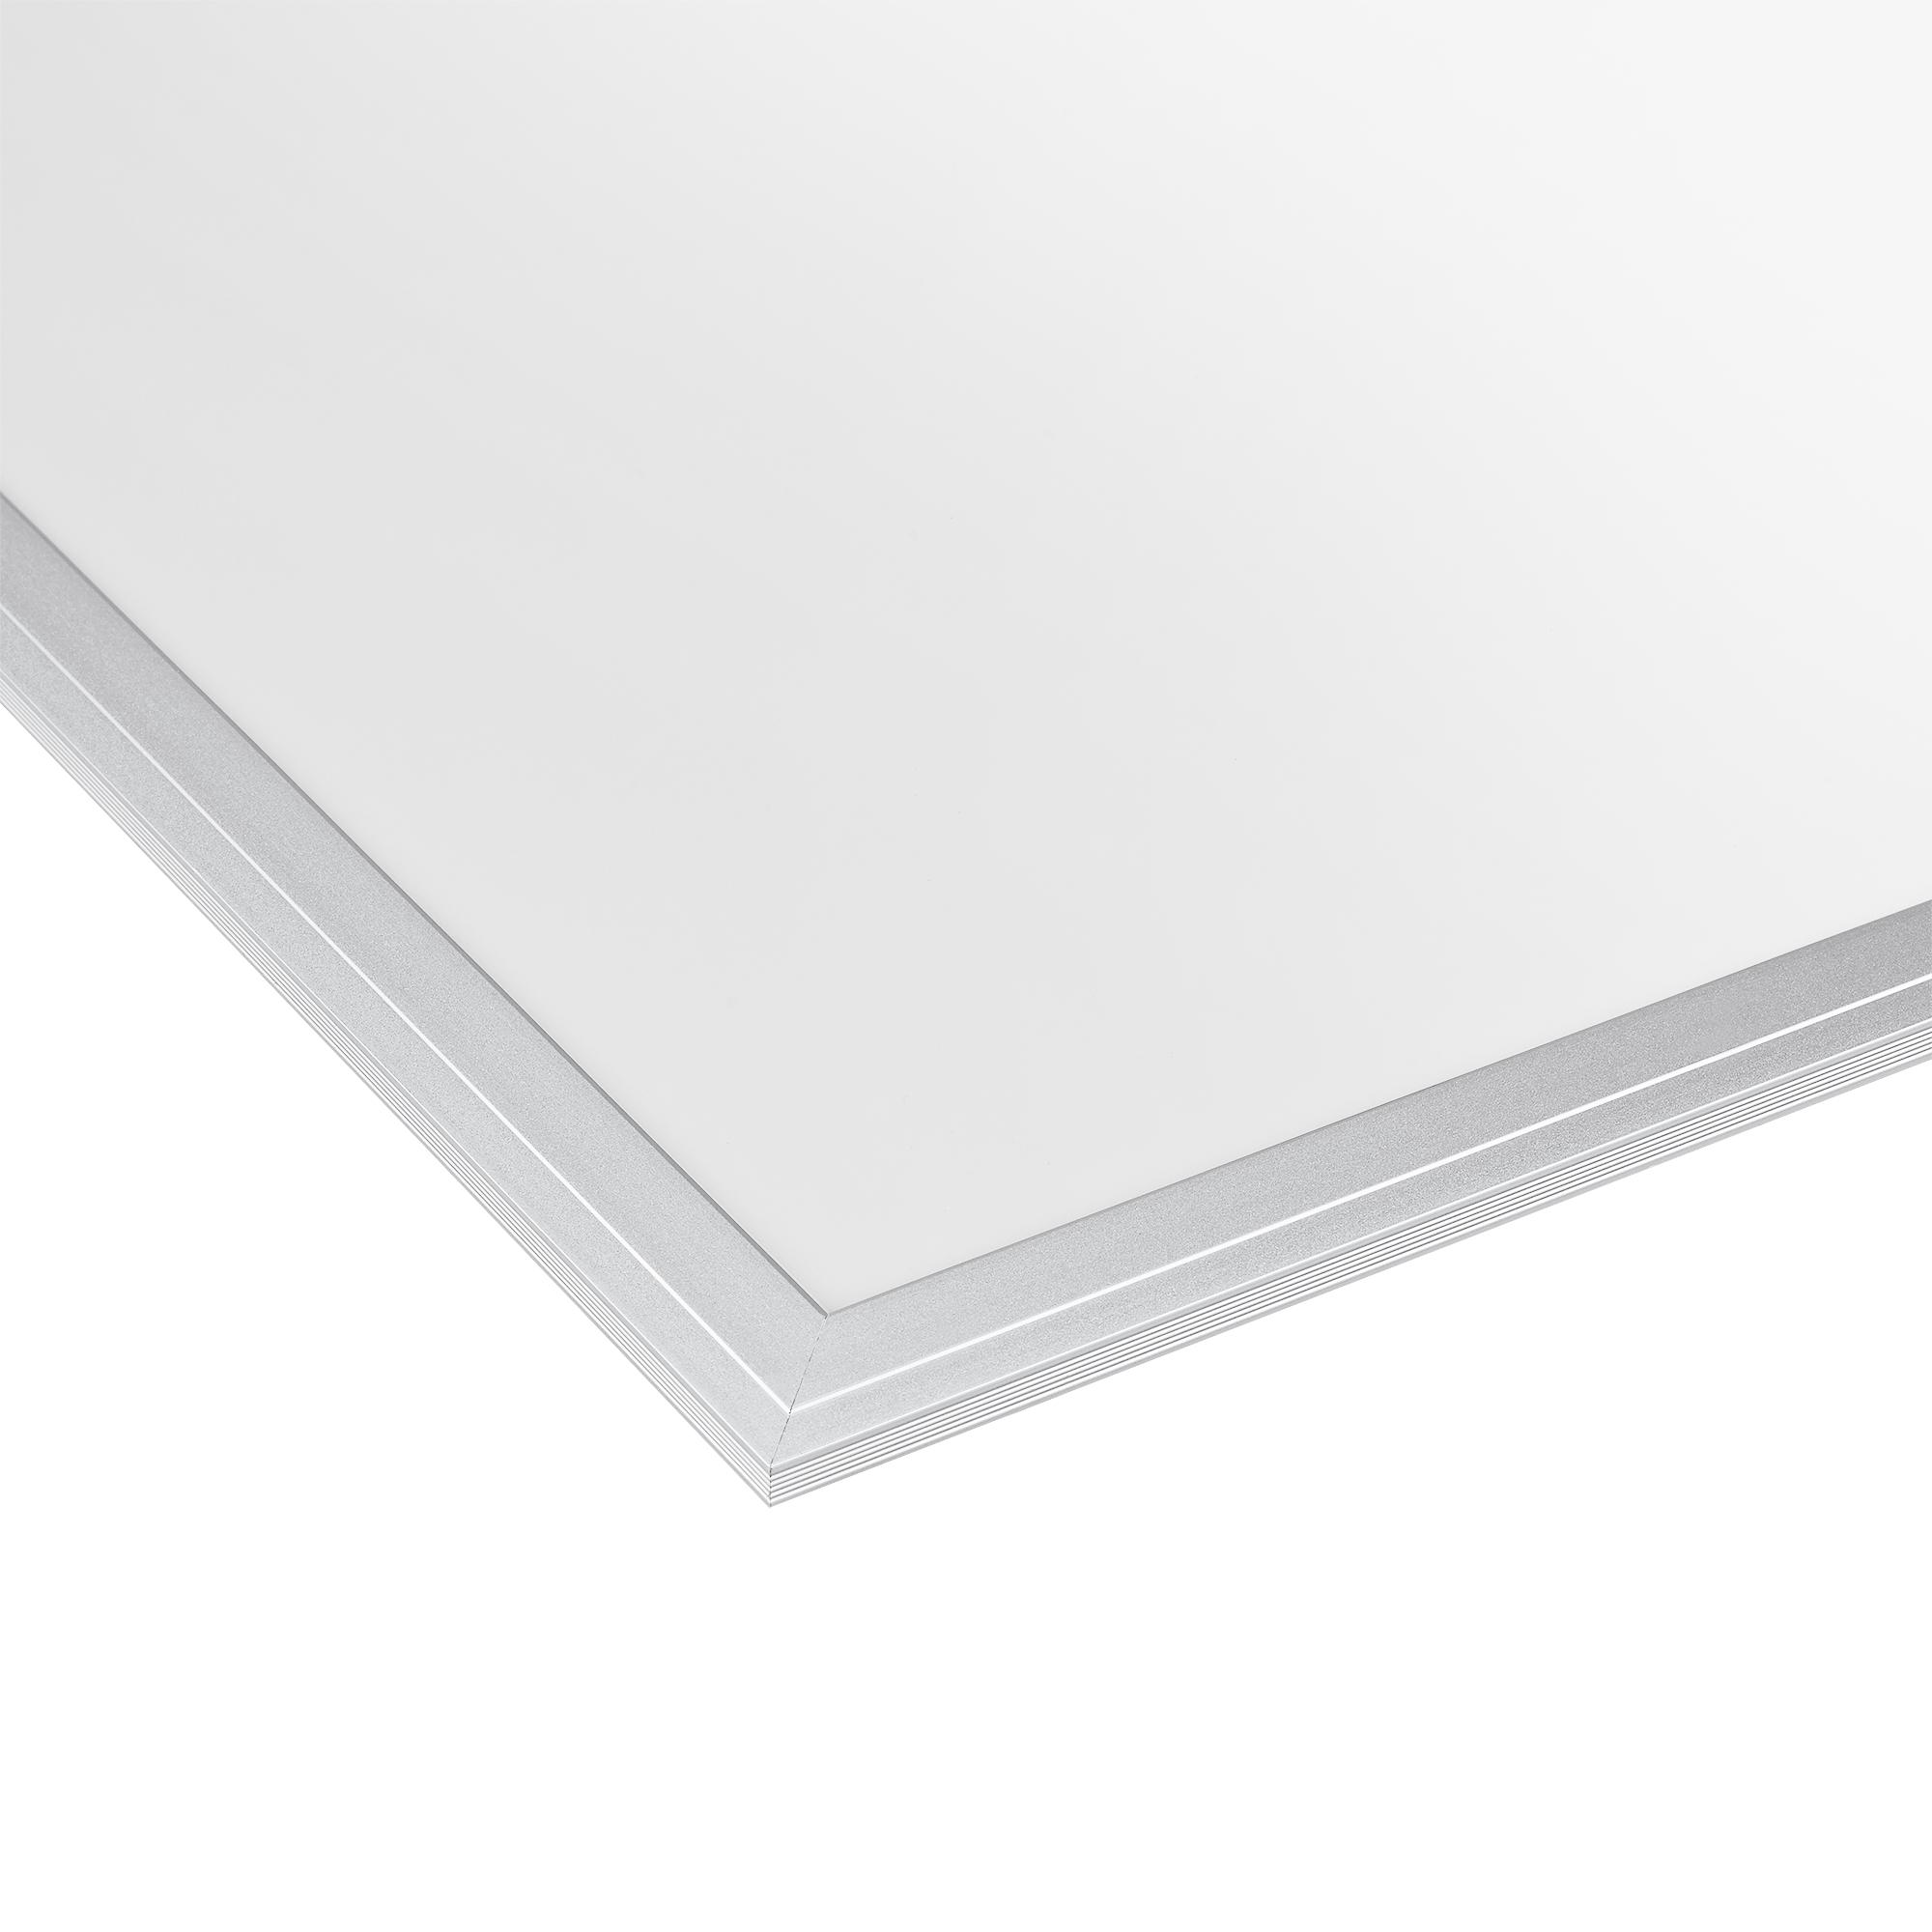 hi power led panel 62x62cm 2800lm 40w neutral wei ultraslim 40 watt 4251155554634 ebay. Black Bedroom Furniture Sets. Home Design Ideas